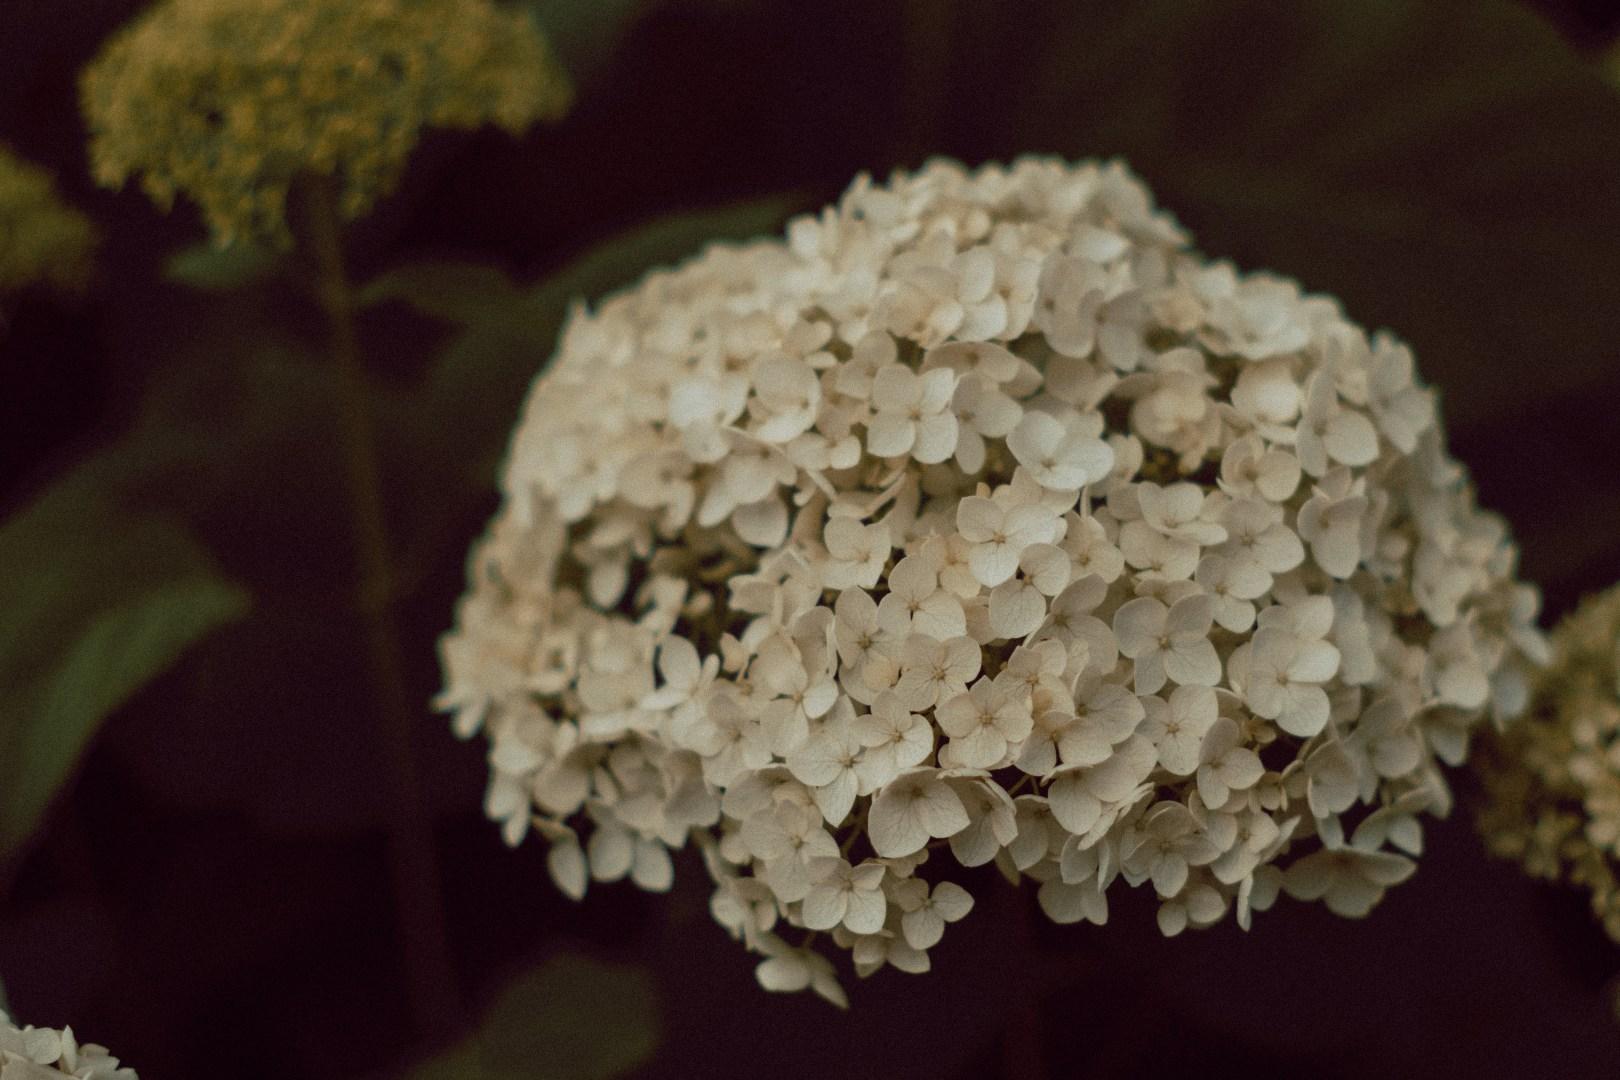 A photo of Hydrangea closeup Uptown